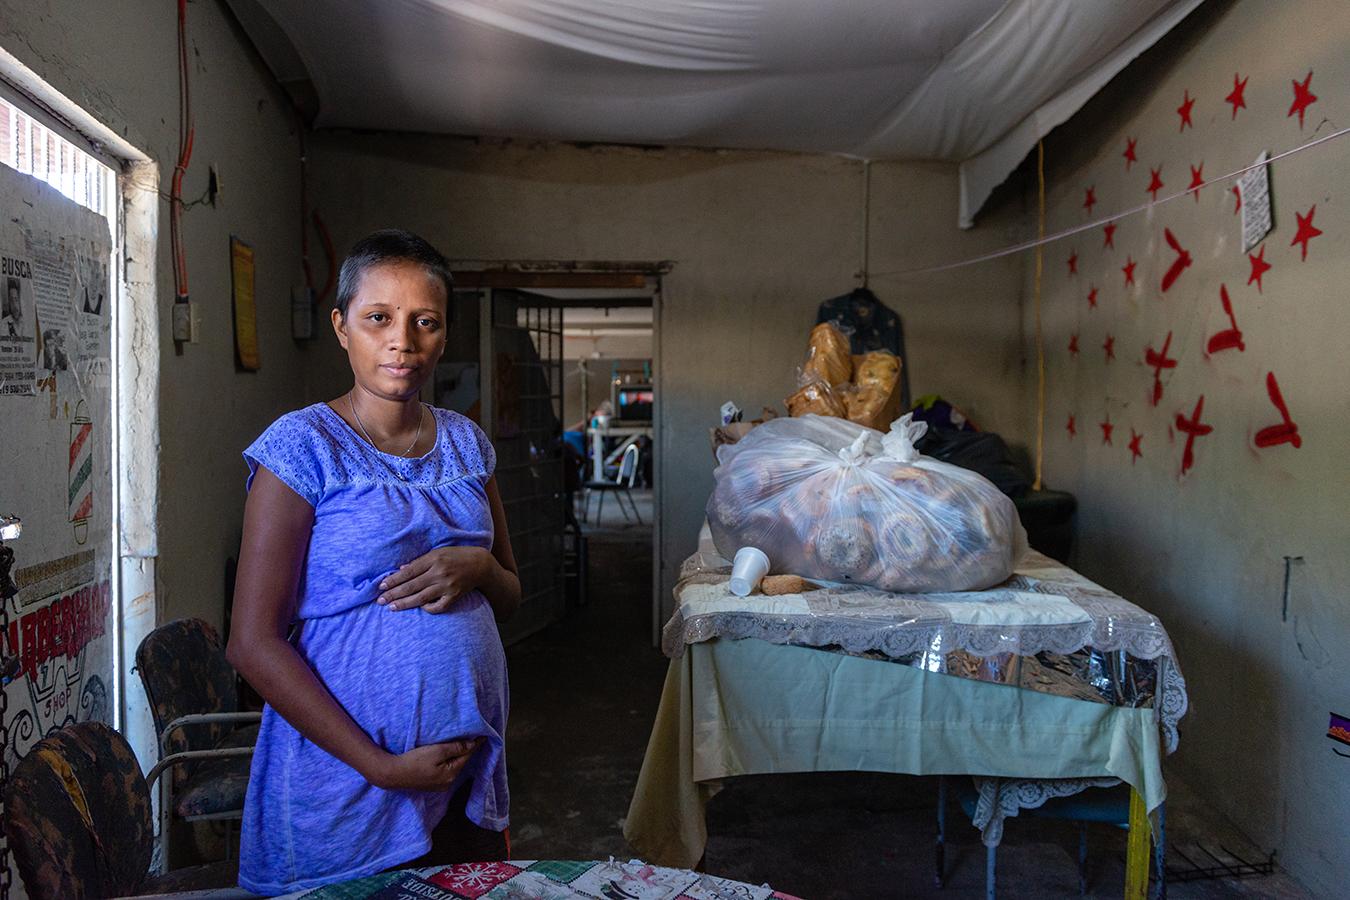 Grevy Marisela Jiménez Martínez. Foto: Heidi de Marco/California Healthline.